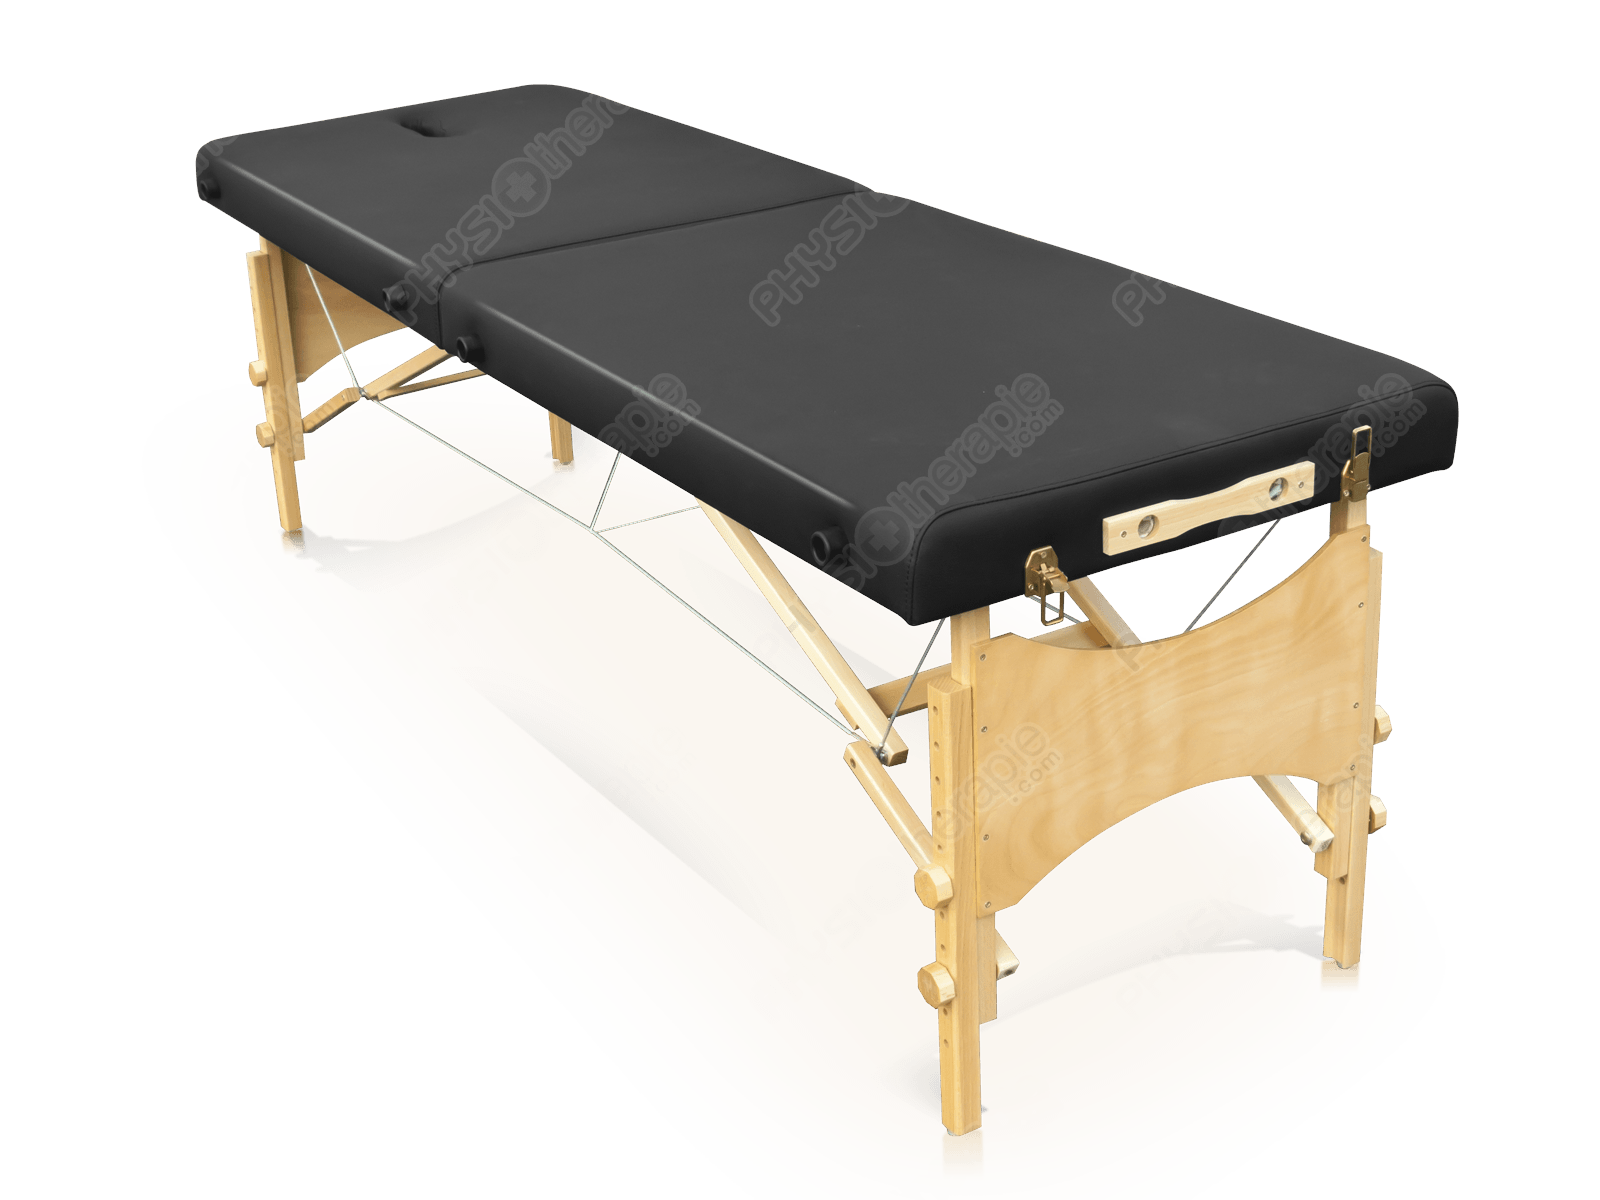 Table de massage pliante physiopro - Table pliante de marche ...